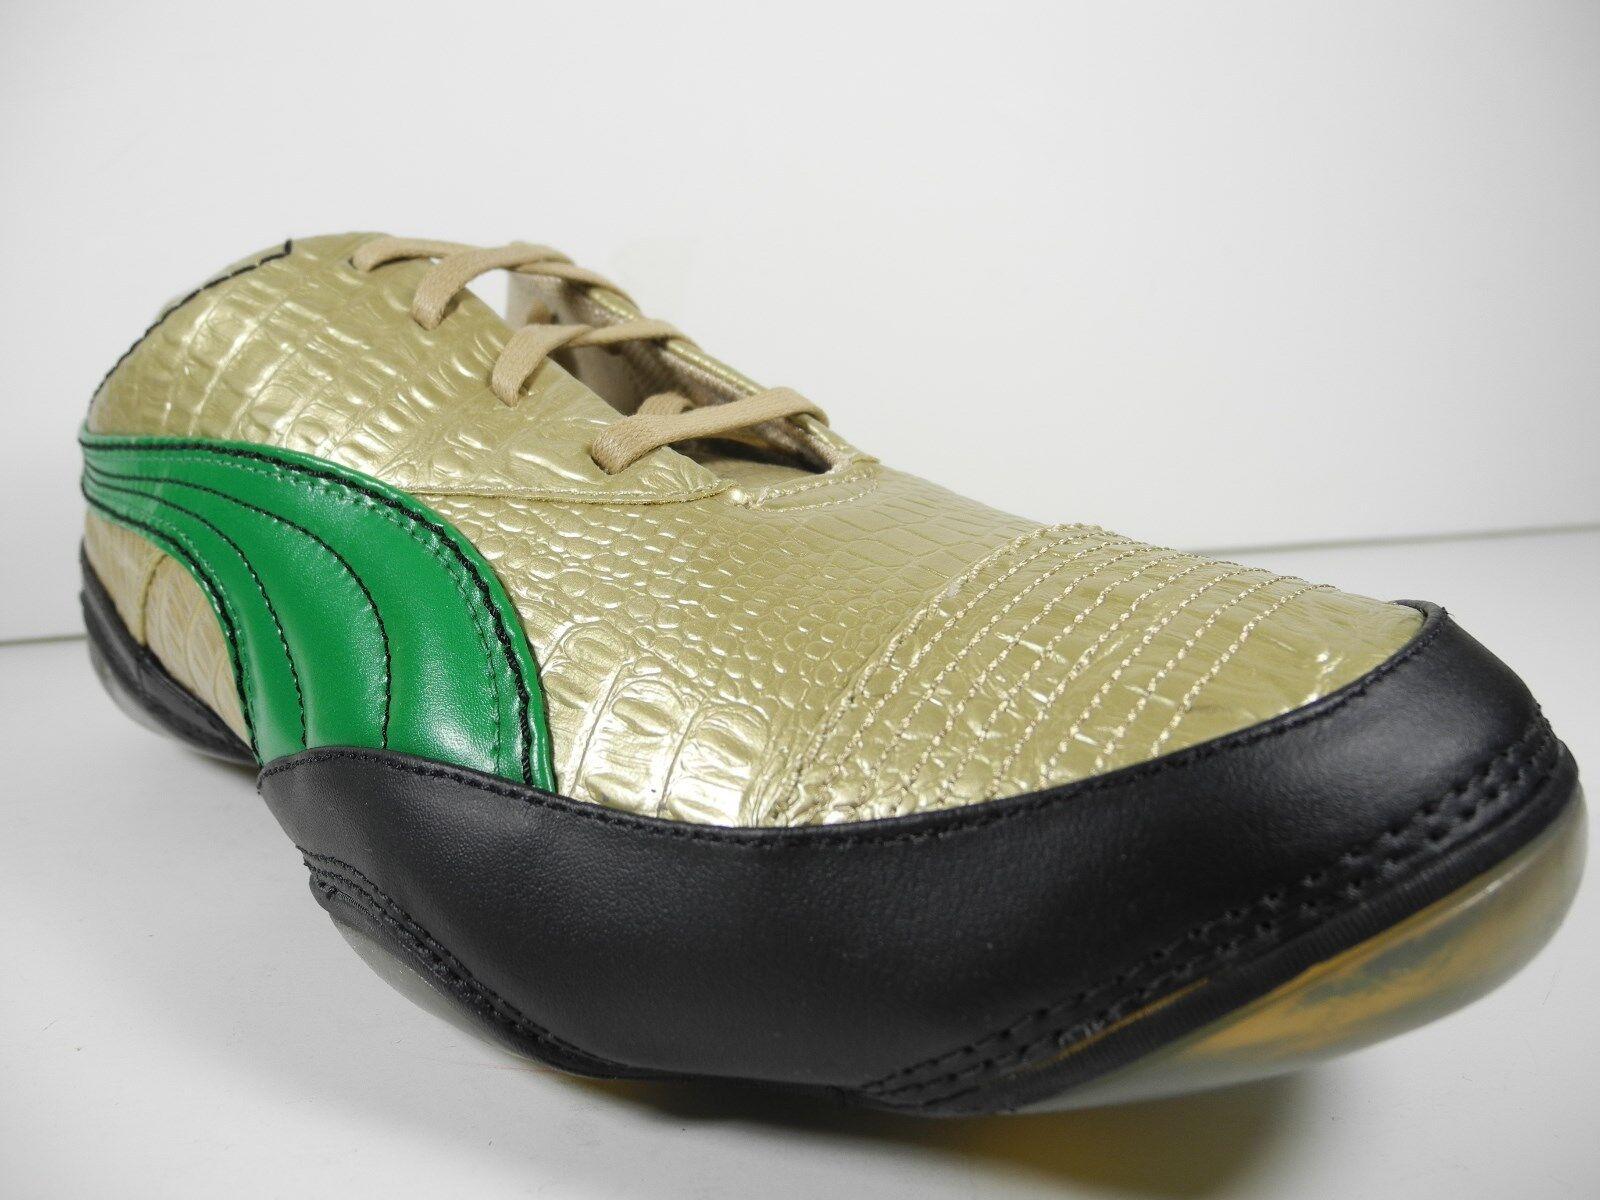 NEW Puma USAN METALLIC CROC Men's Shoes Size US 11.5 1